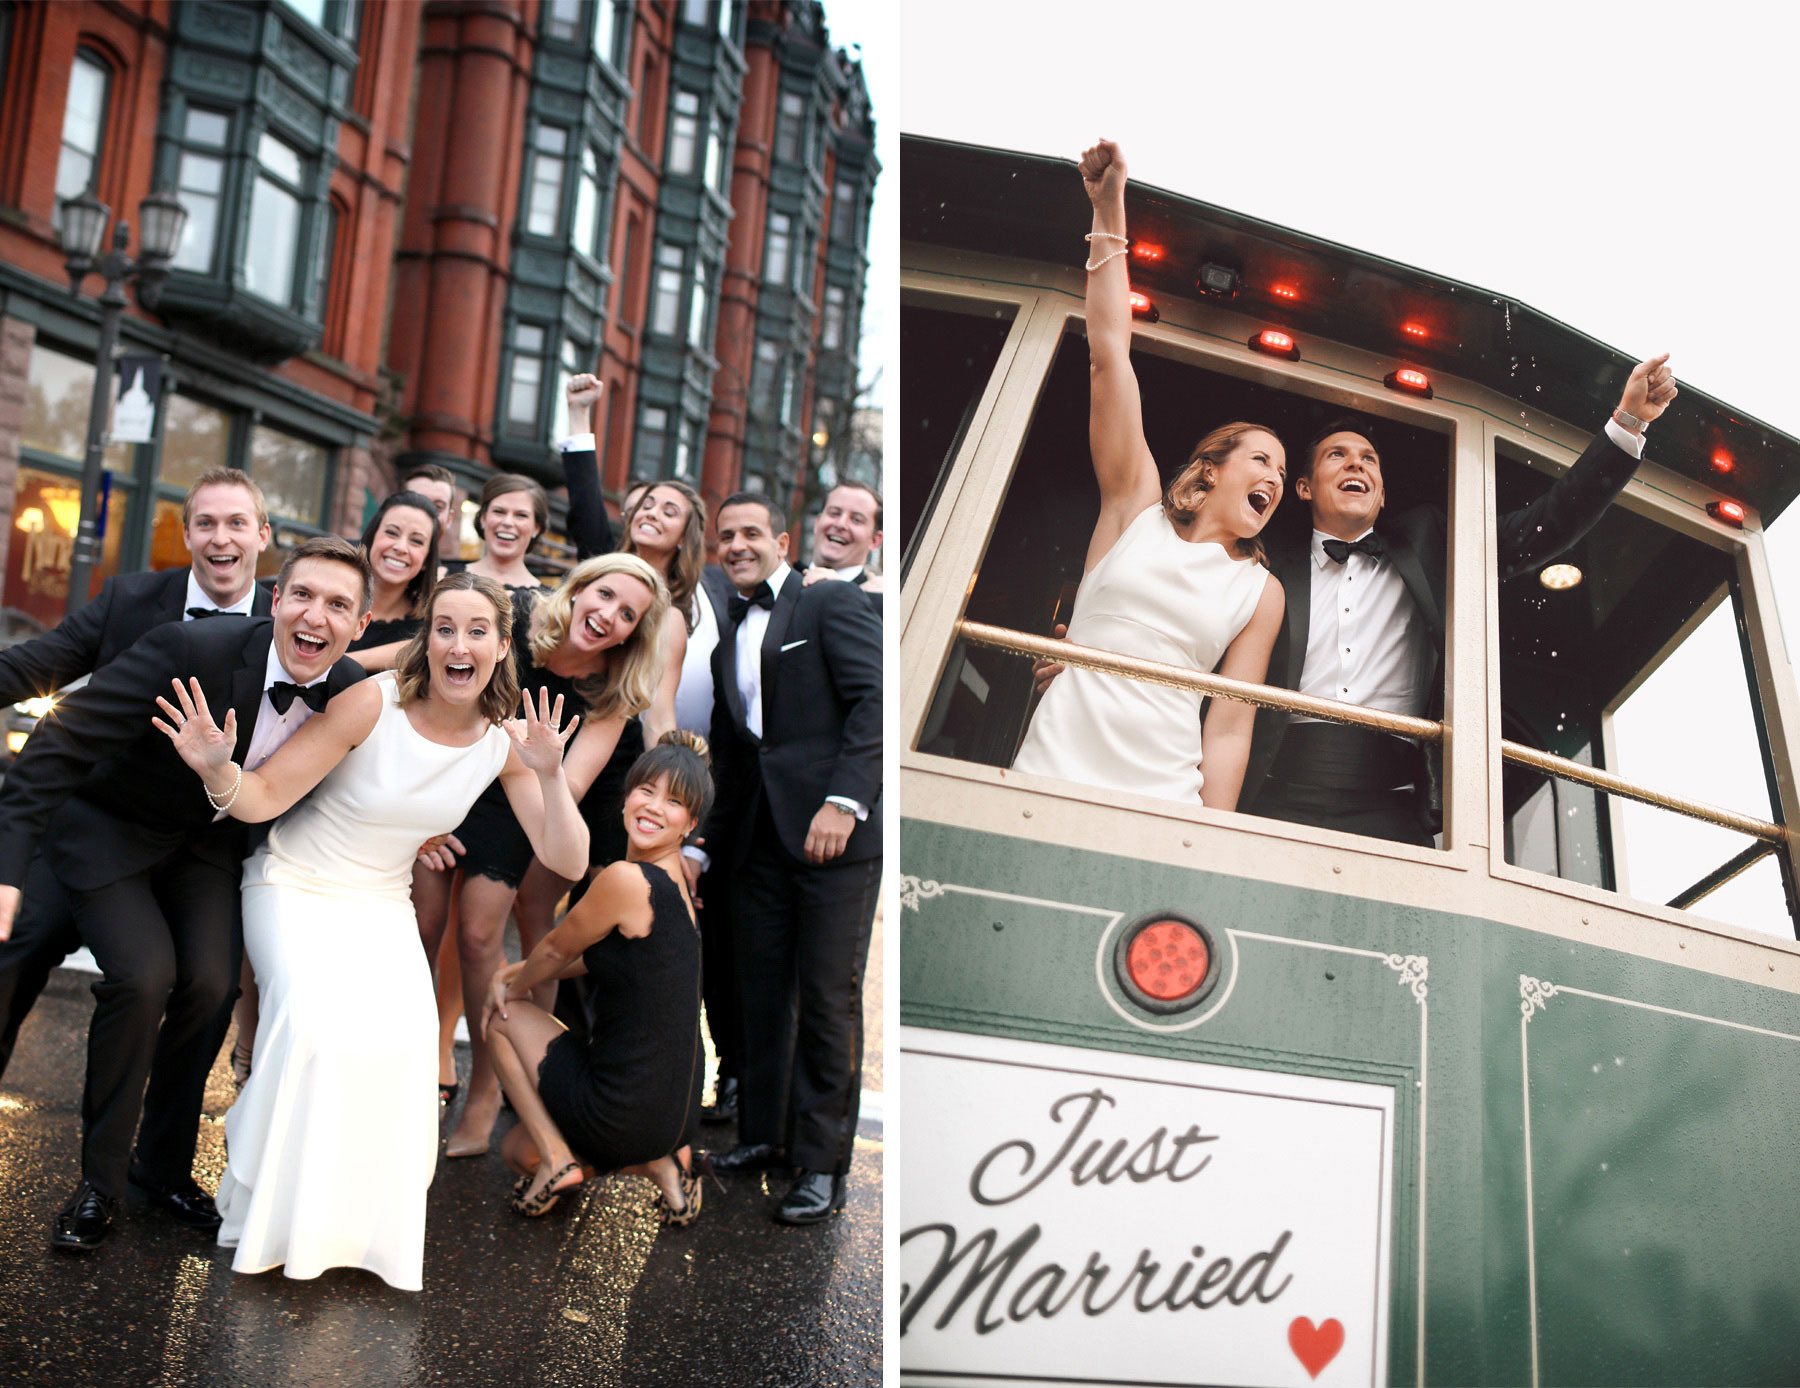 17-Saint-Paul-Minnesota-Wedding-Photographer-by-Andrew-Vick-Photography-Fall-Autumn-Bride-Groom-Bridal-Party-Groomsmen-Bridesmaids-Rain-Trolley-Vintage-Kathryn-and-Sam.jpg